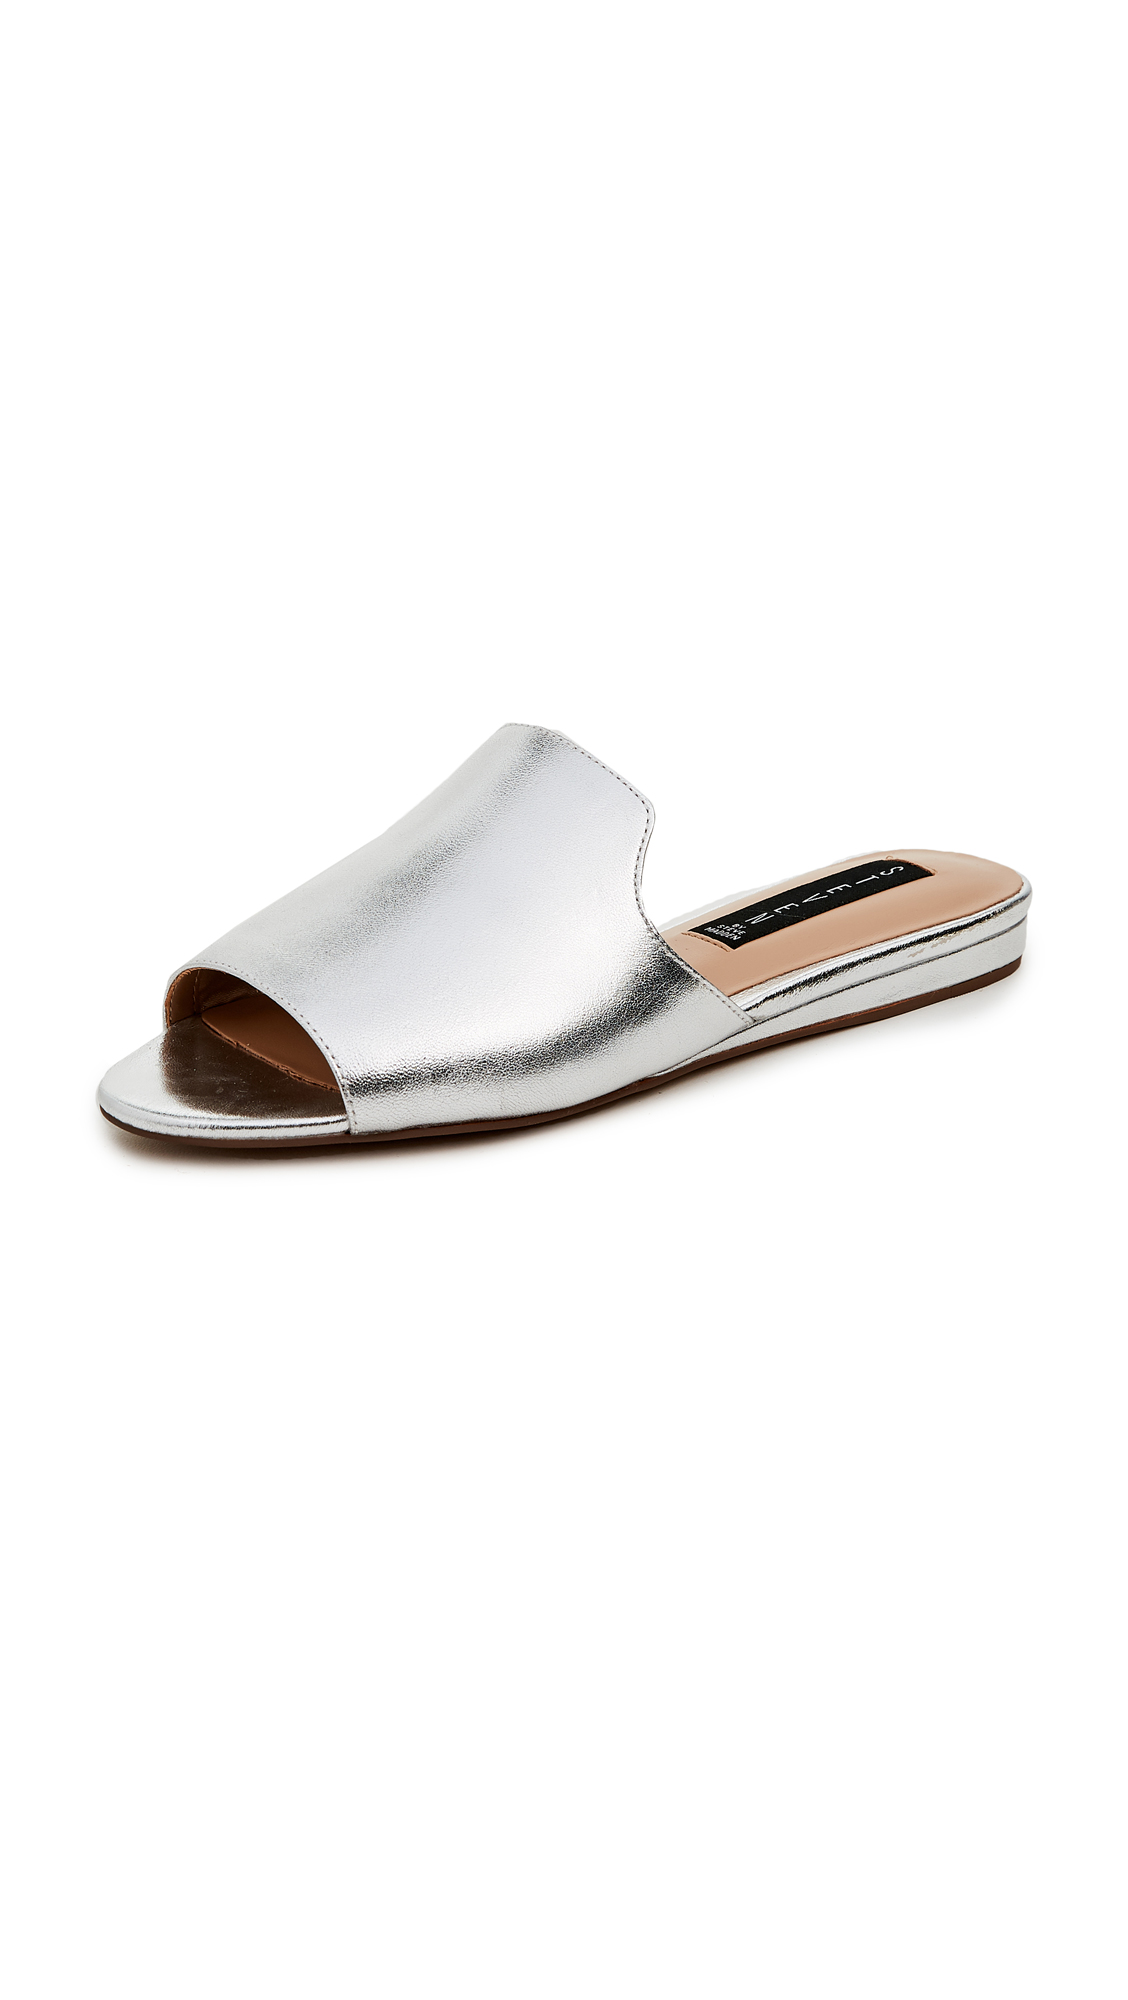 Steven Sensai Peep Toe Sandals - Silver